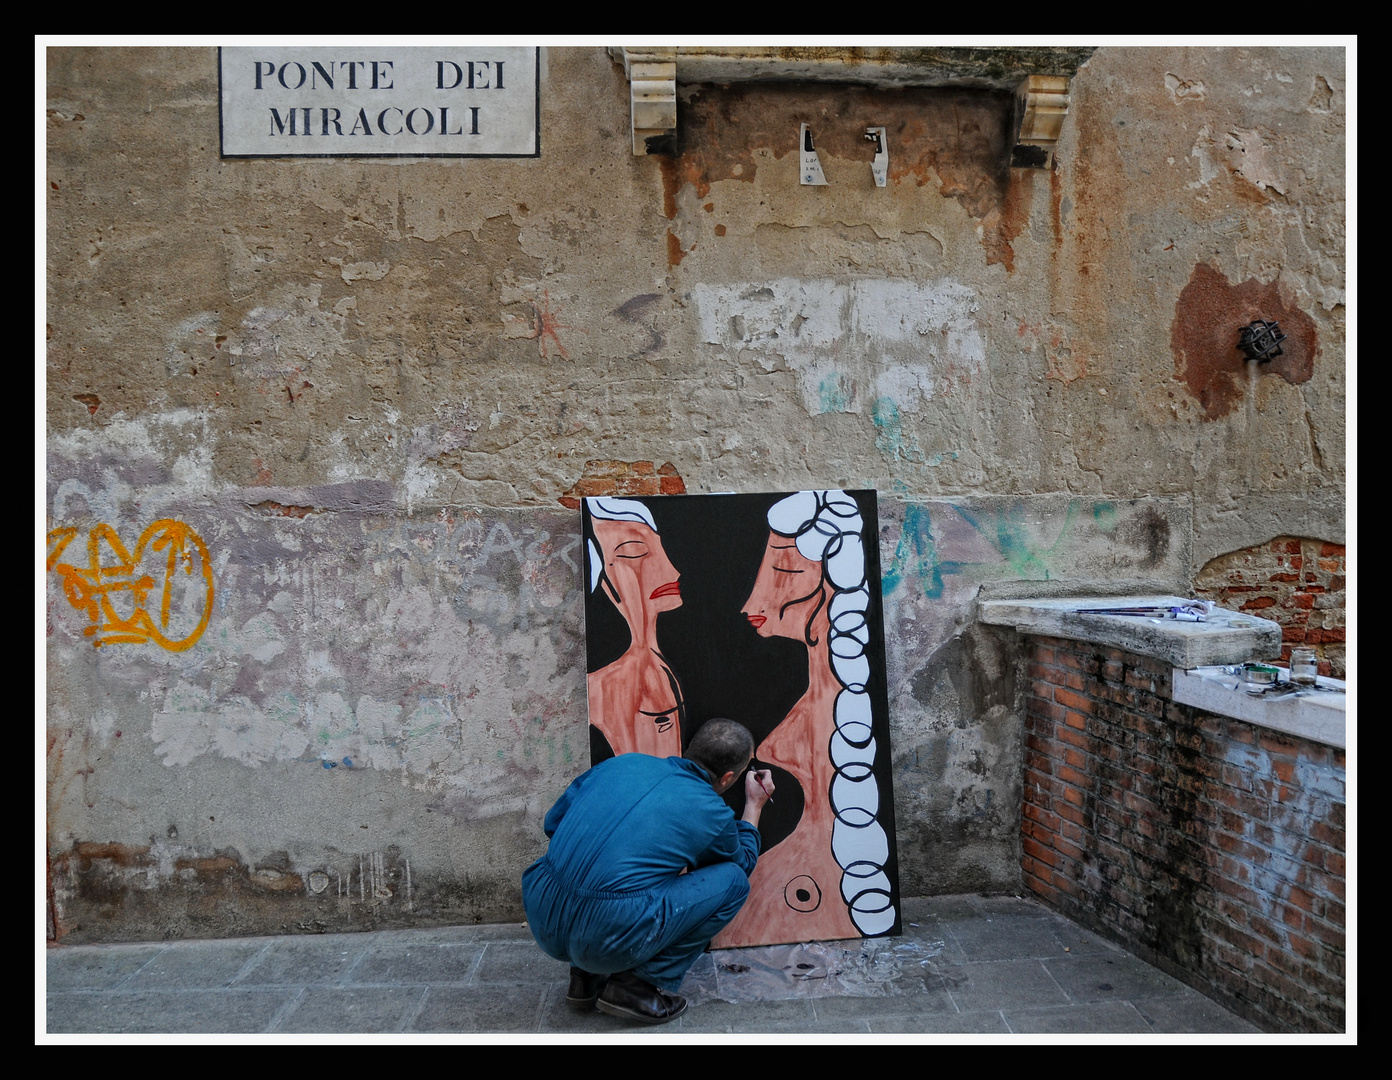 Venedig - Ponte dei Miracoli